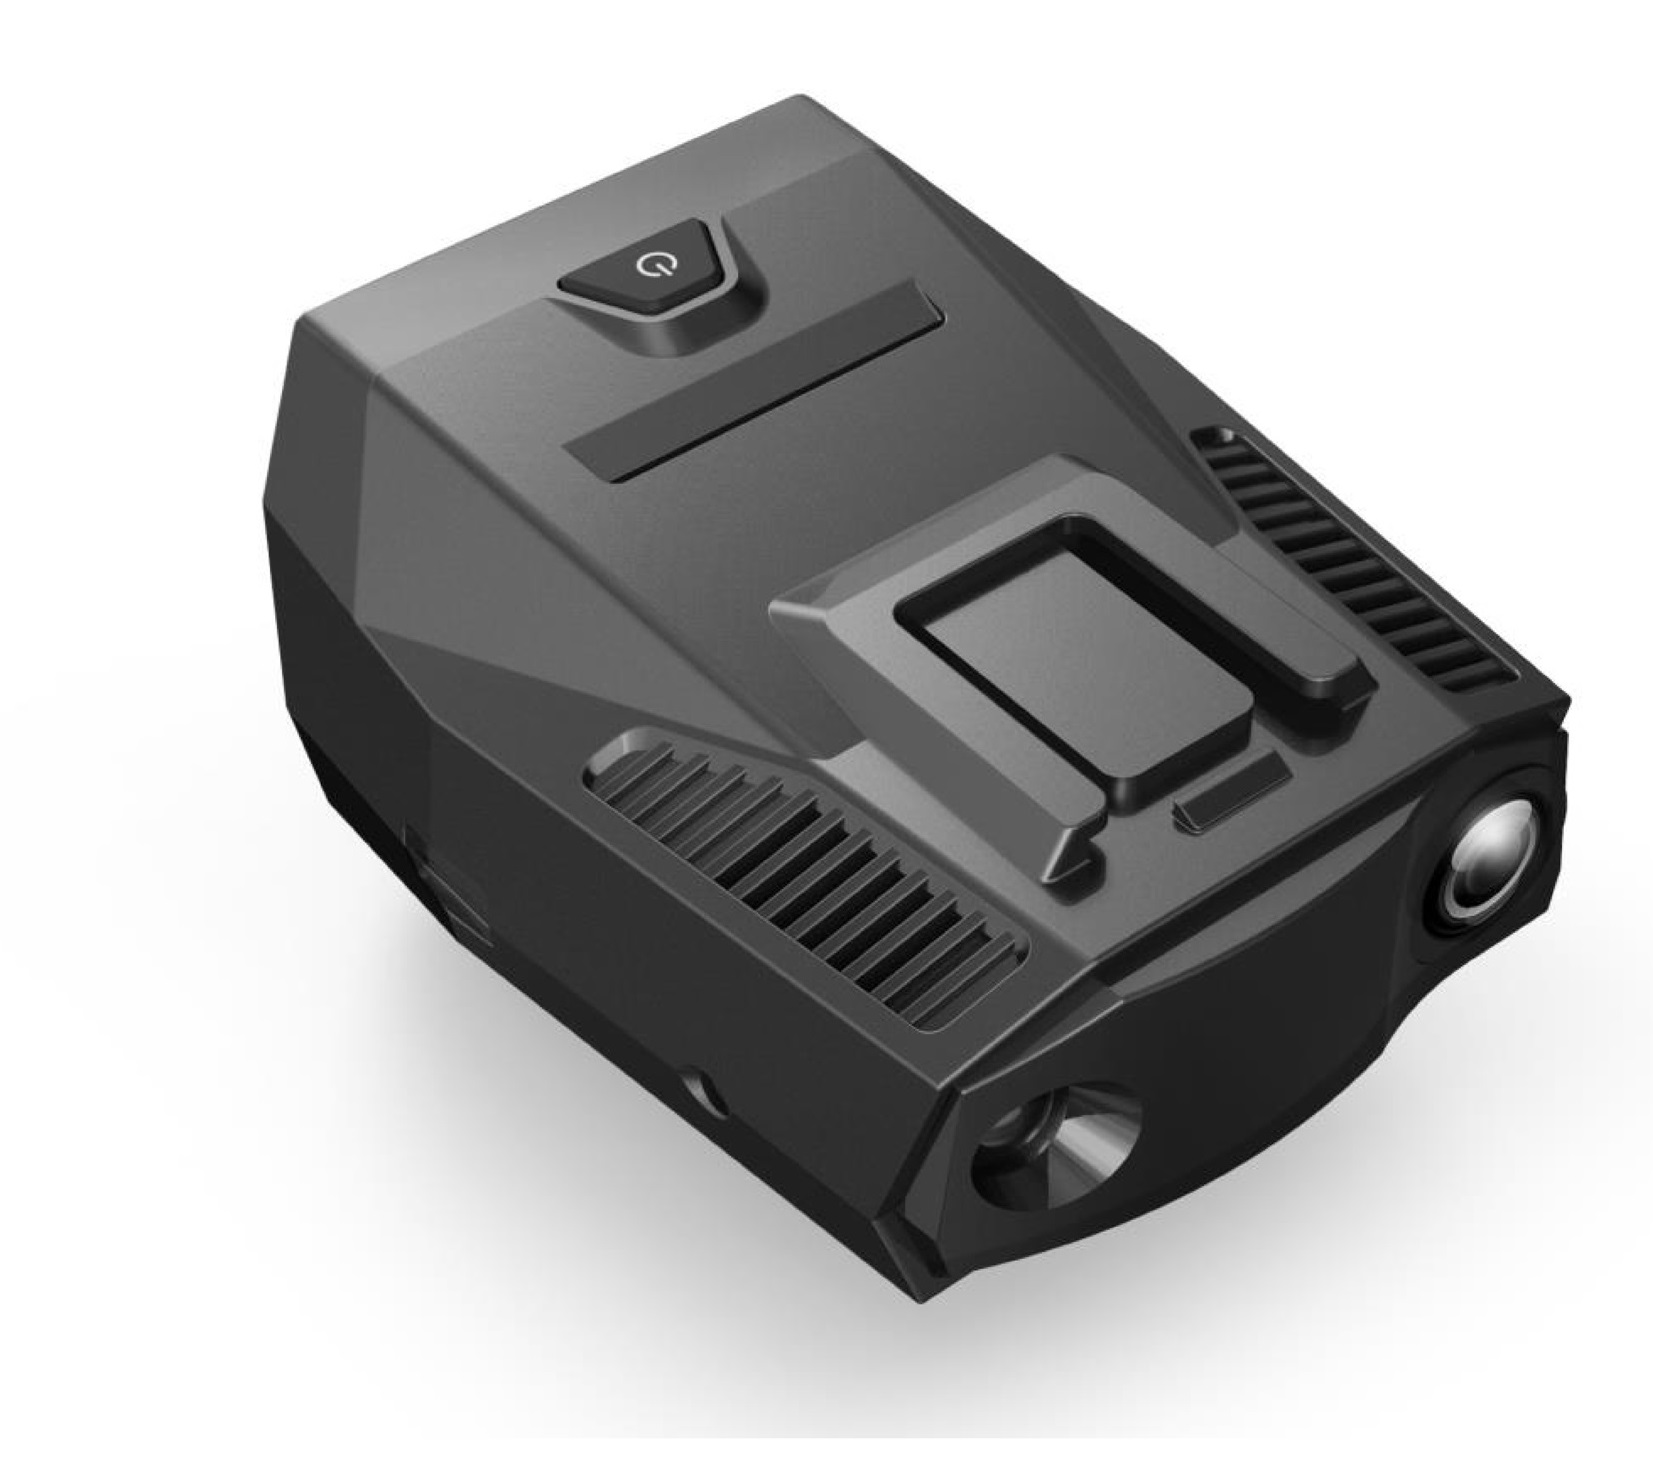 Комбо-устройство PlayMe P600SG в Арзамасе